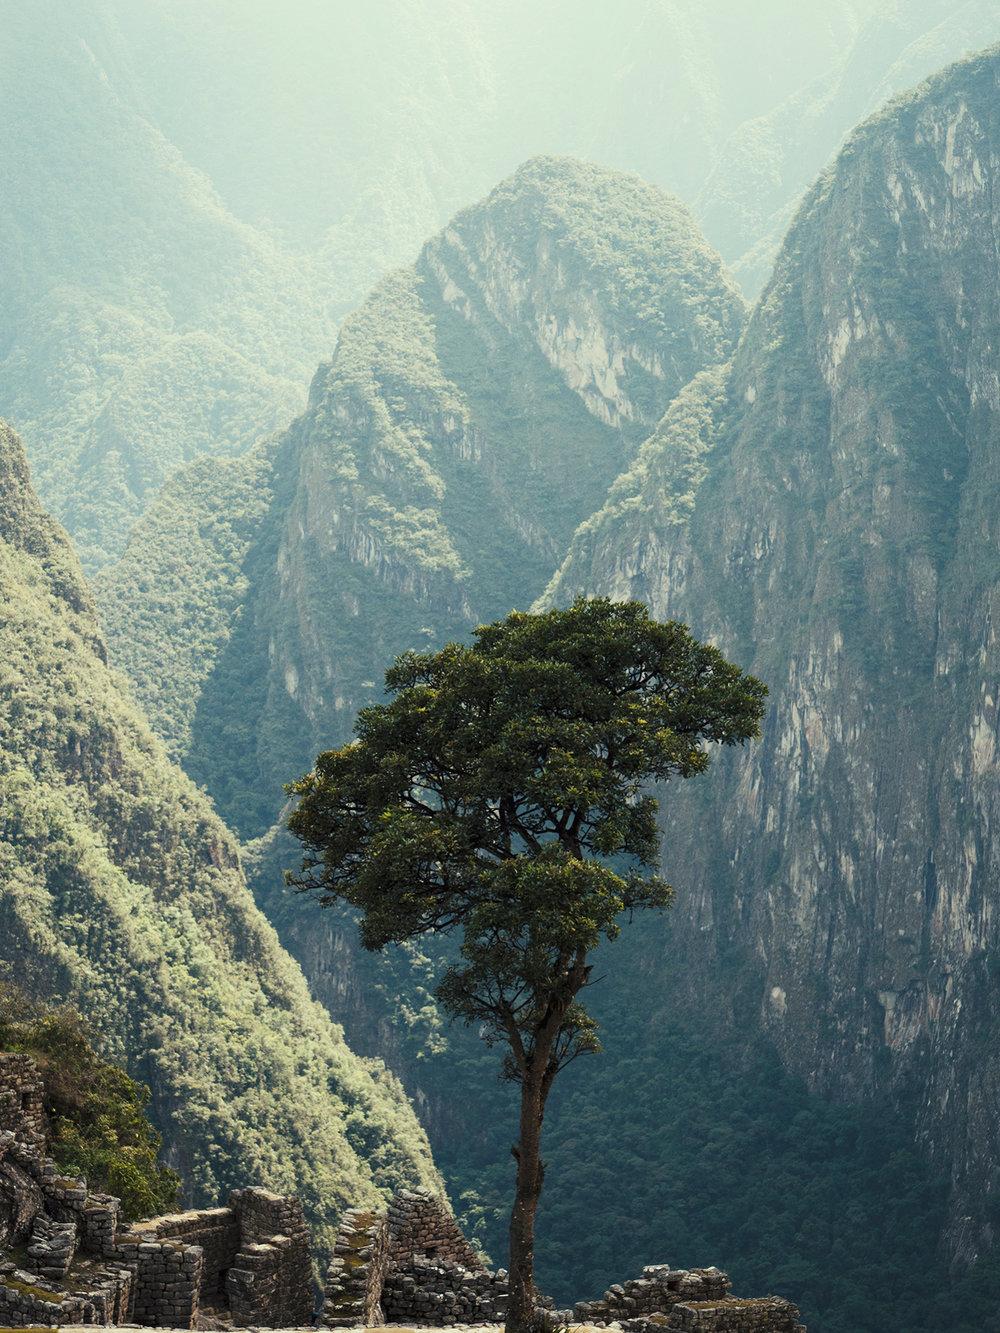 Andes gebergte Peru, november 2017 © Willem SIzoo